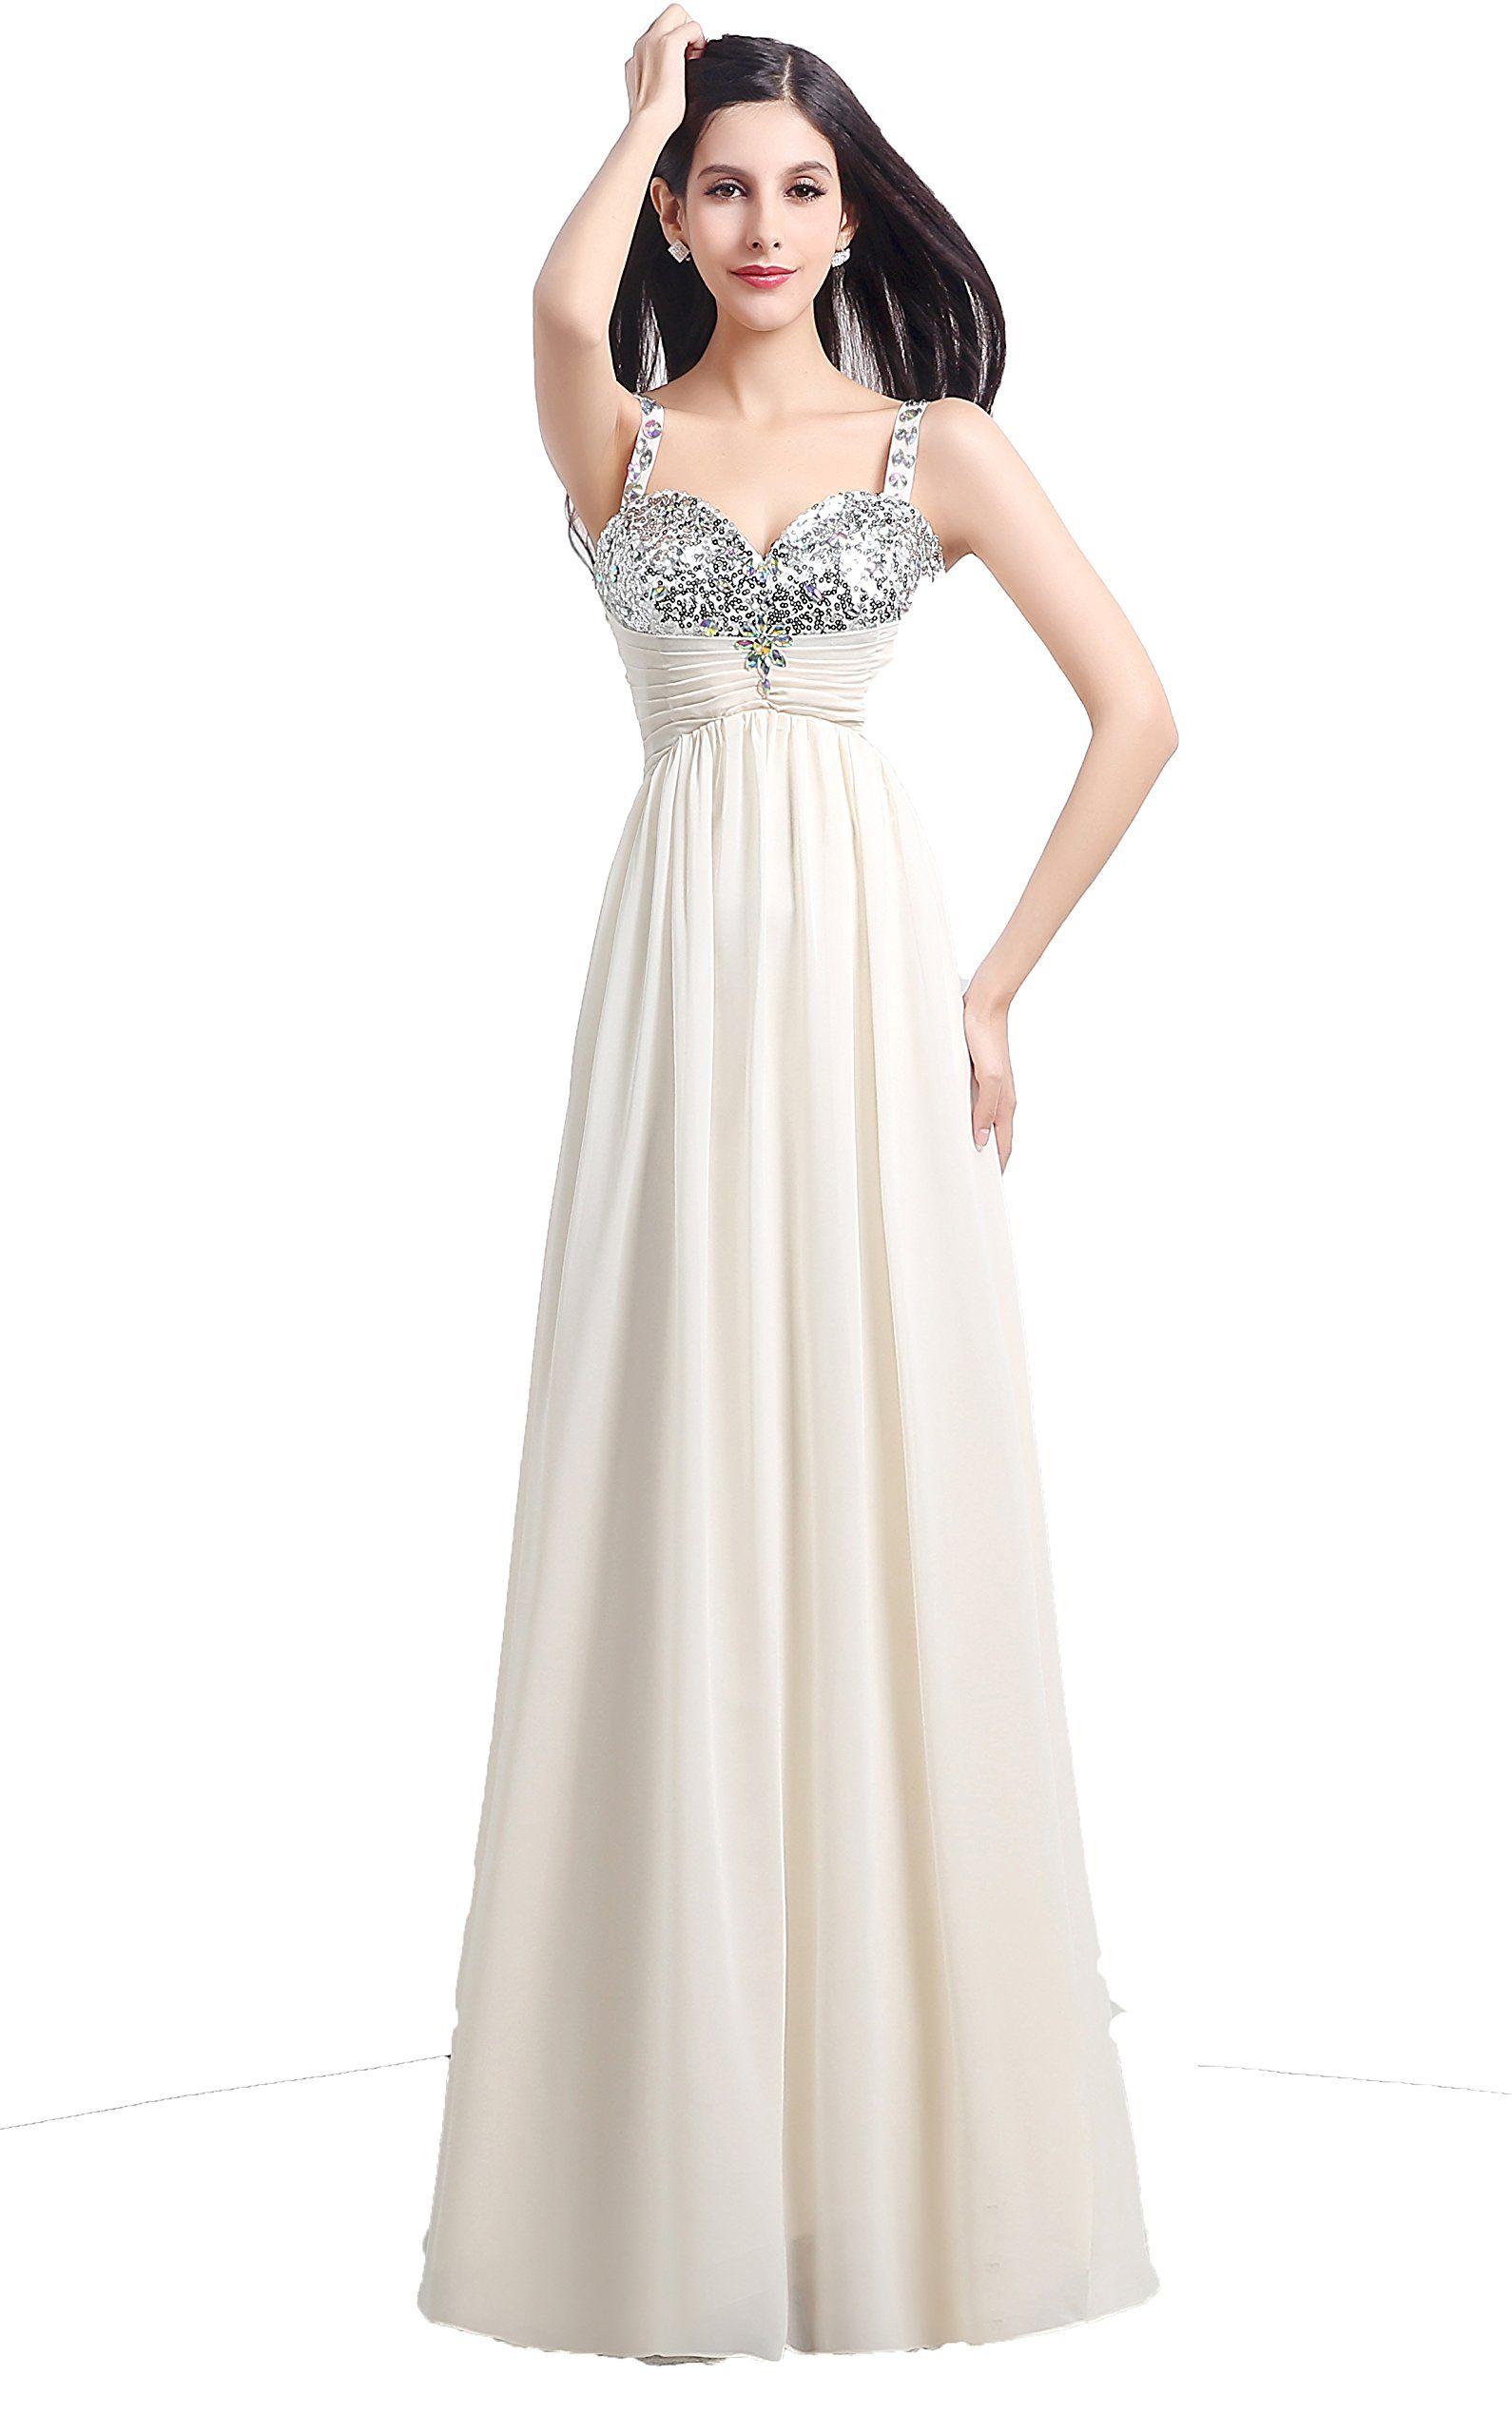 Annieus bridal womenus chiffon sequins evening dresses long prom